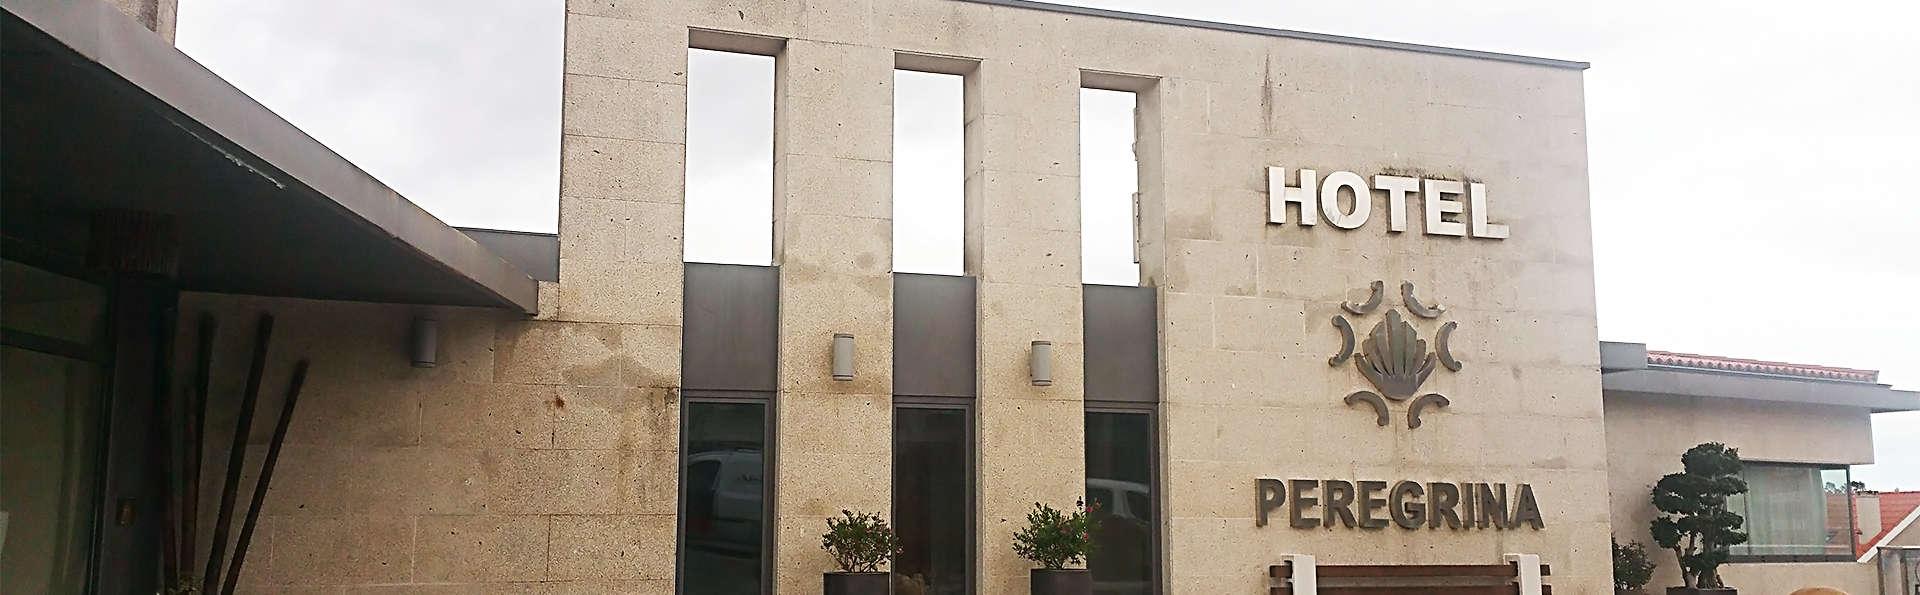 Hotel Peregrina - EDIT_front1.jpg